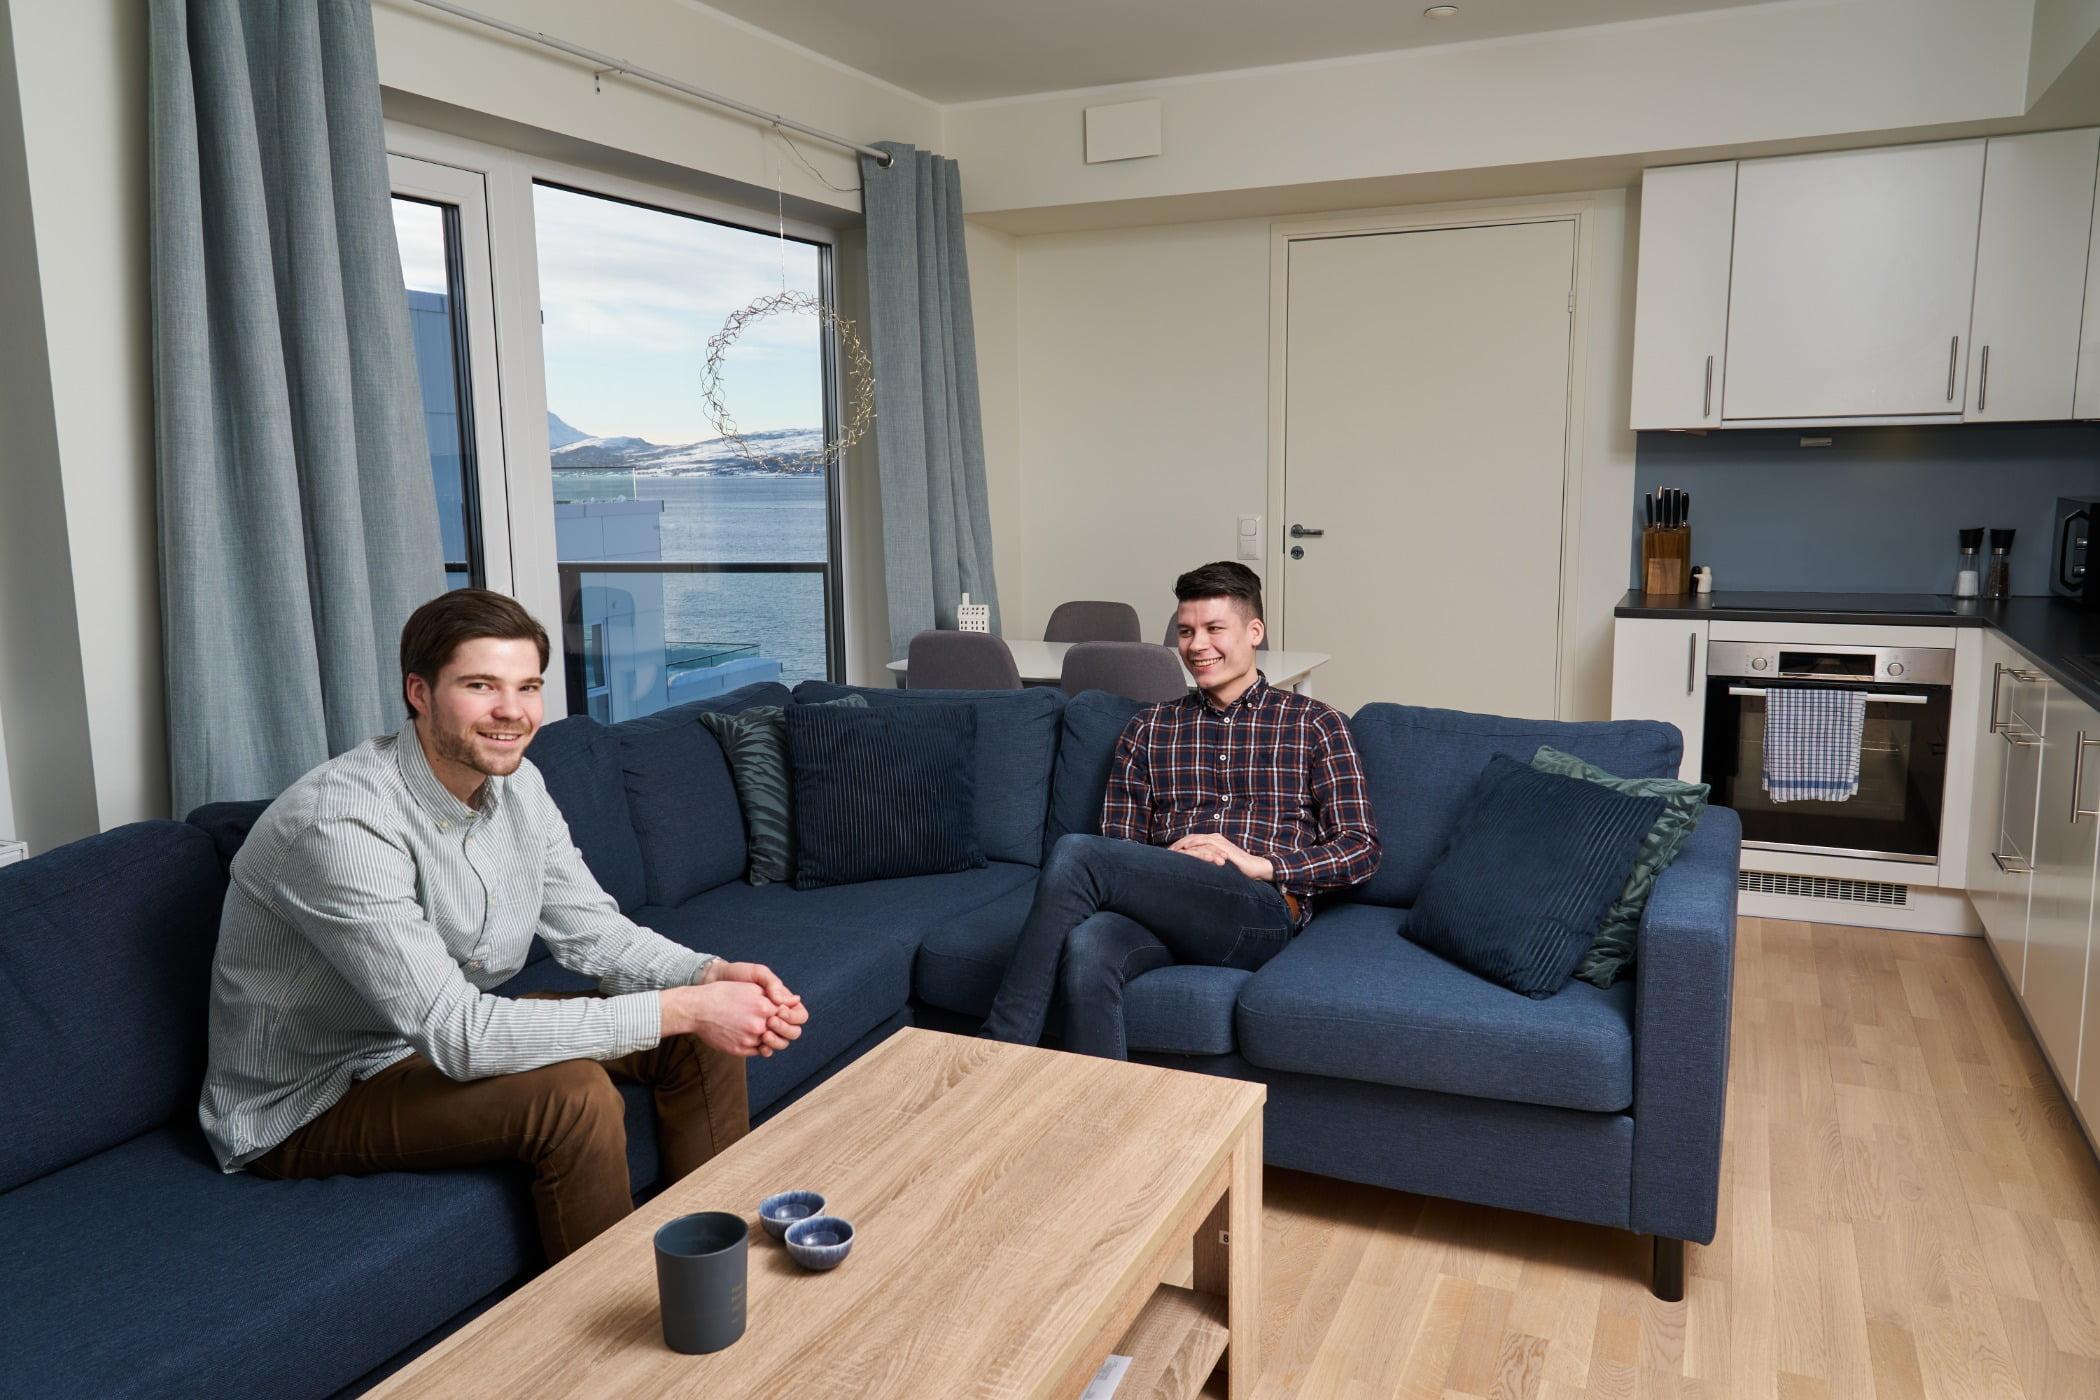 studio couch, Furniture, Comfort, Table, Building, Flooring, Window, Floor, Curtain